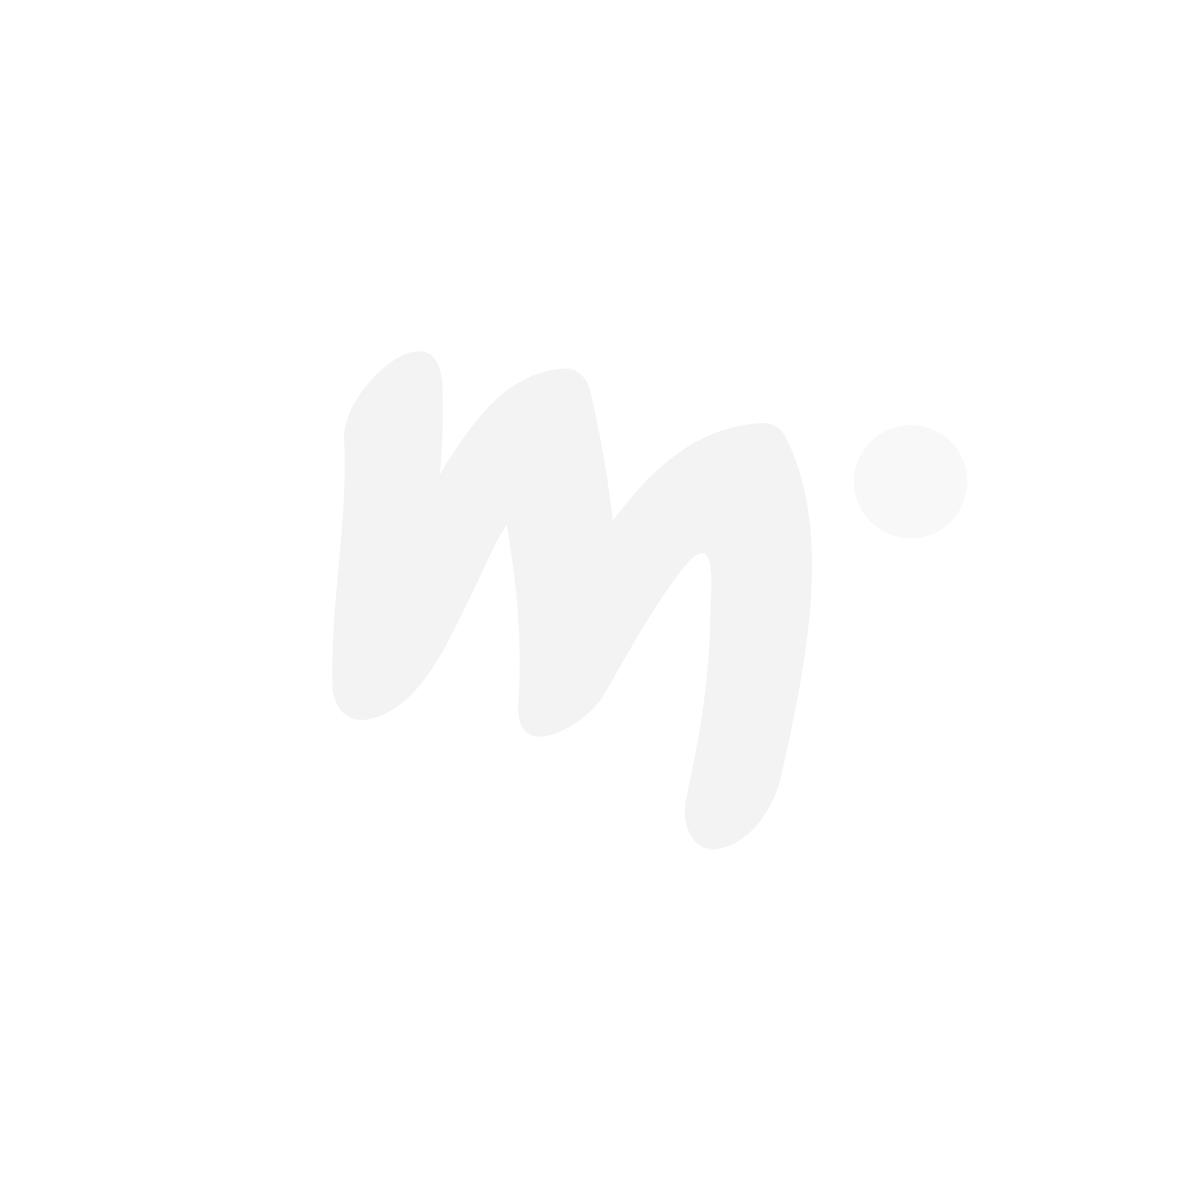 Mx Deco Musiikkitonttu 30 cm